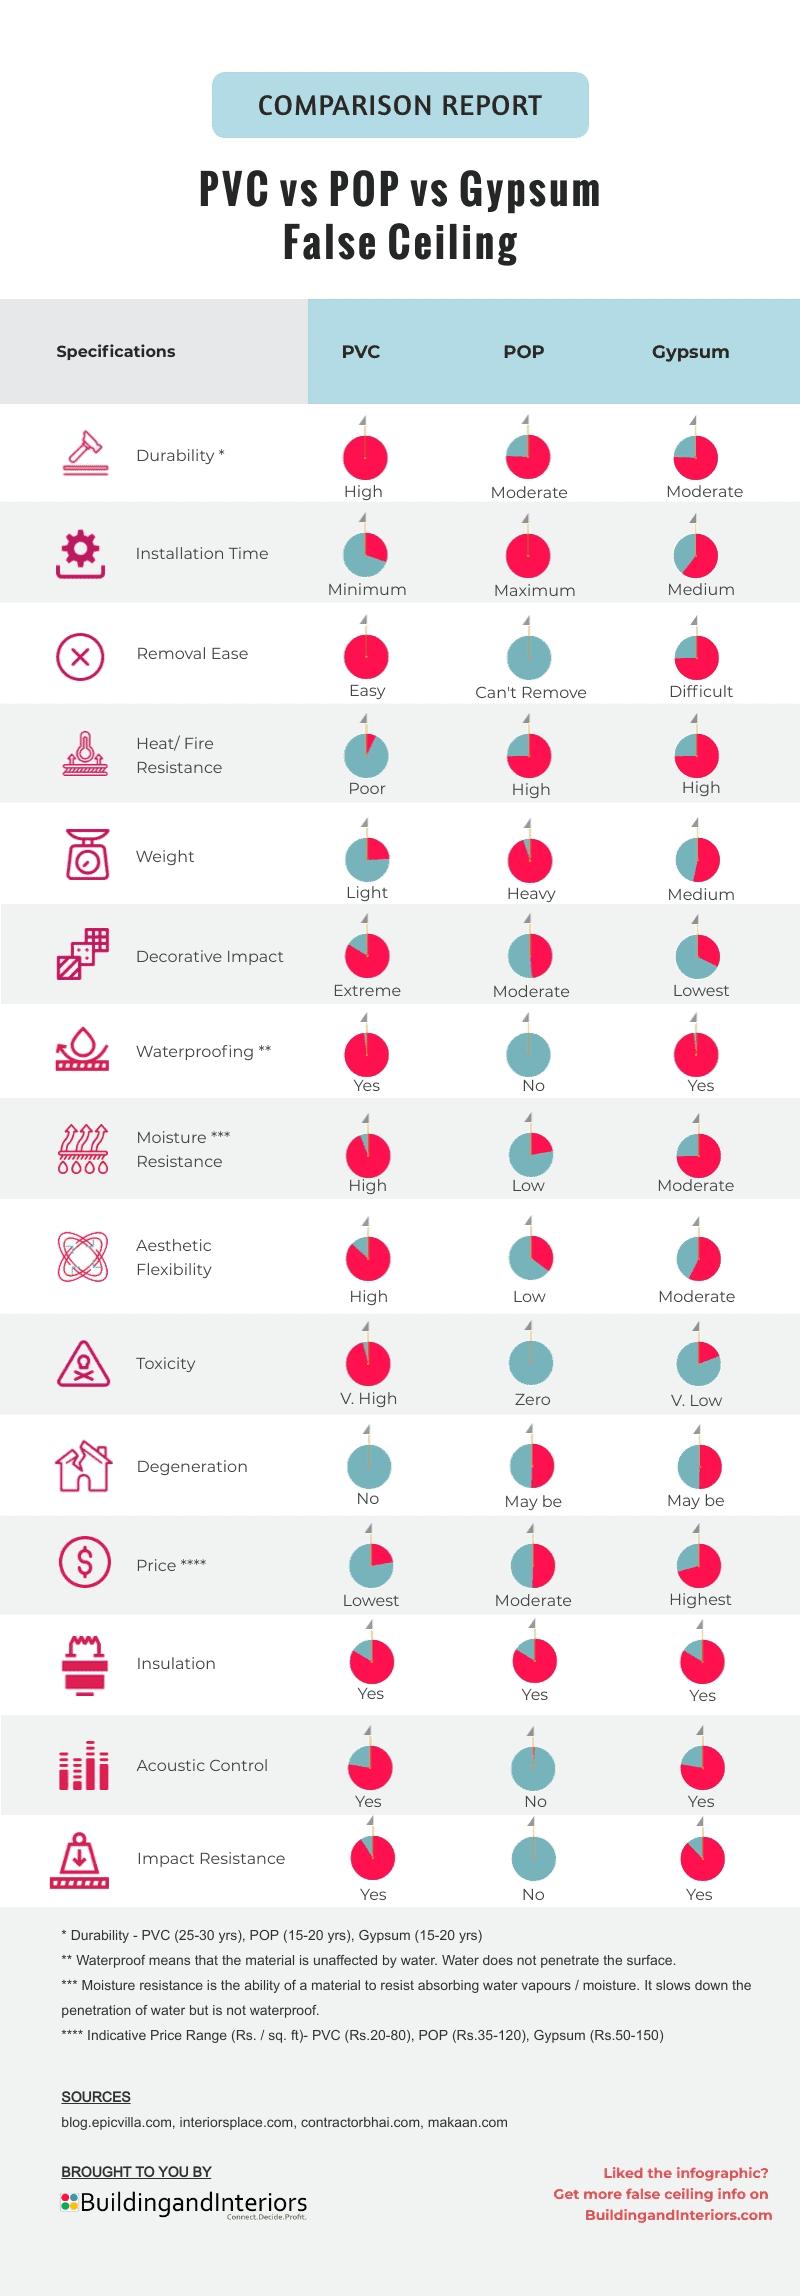 POP vs Gypsum Vs PVC Comparison